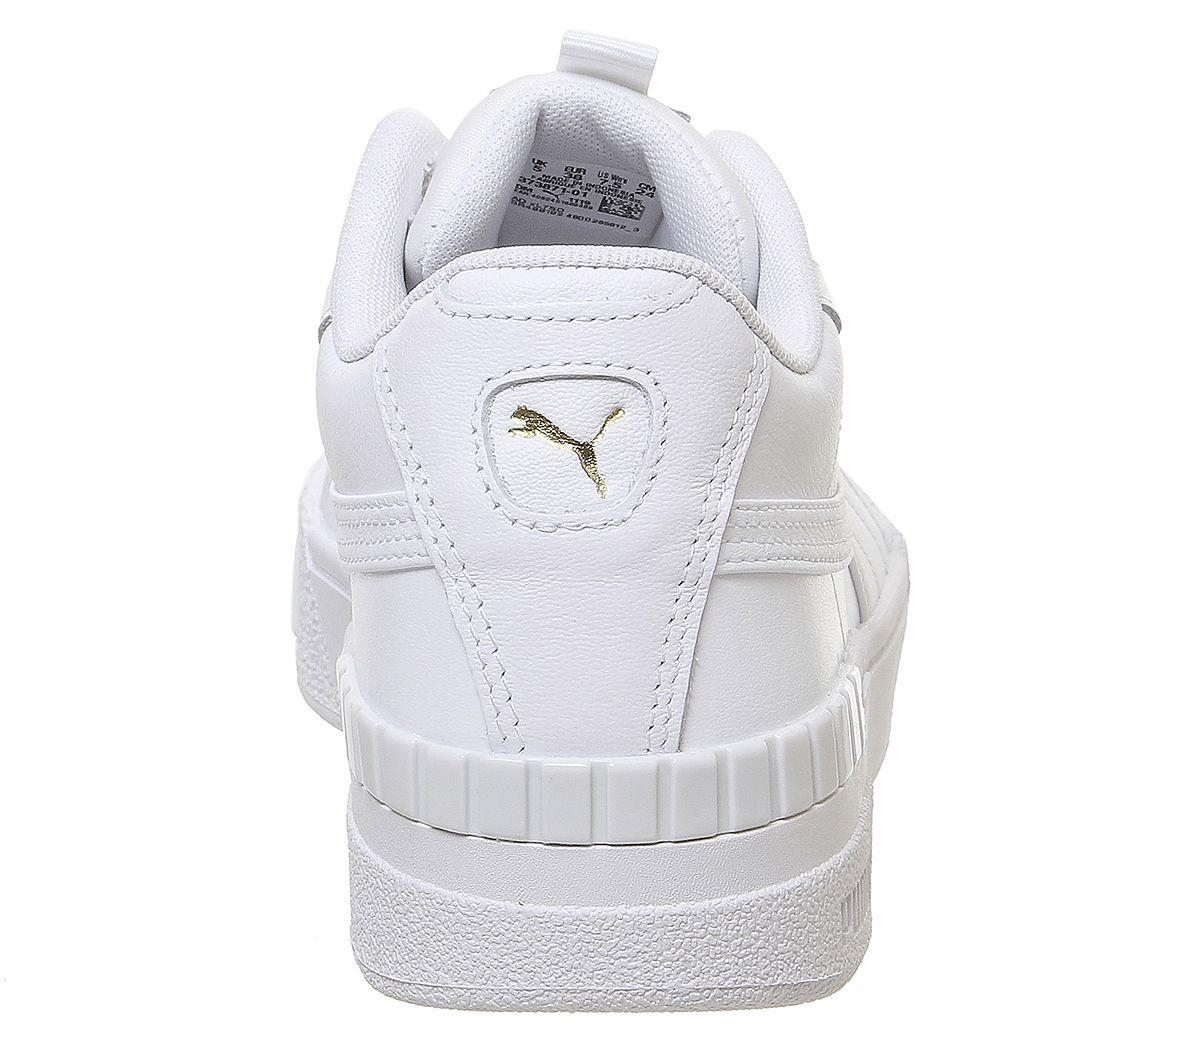 Chaussures-Femme-Puma-Cali-Sport-Baskets-Blanc-Baskets-Chaussures miniature 3